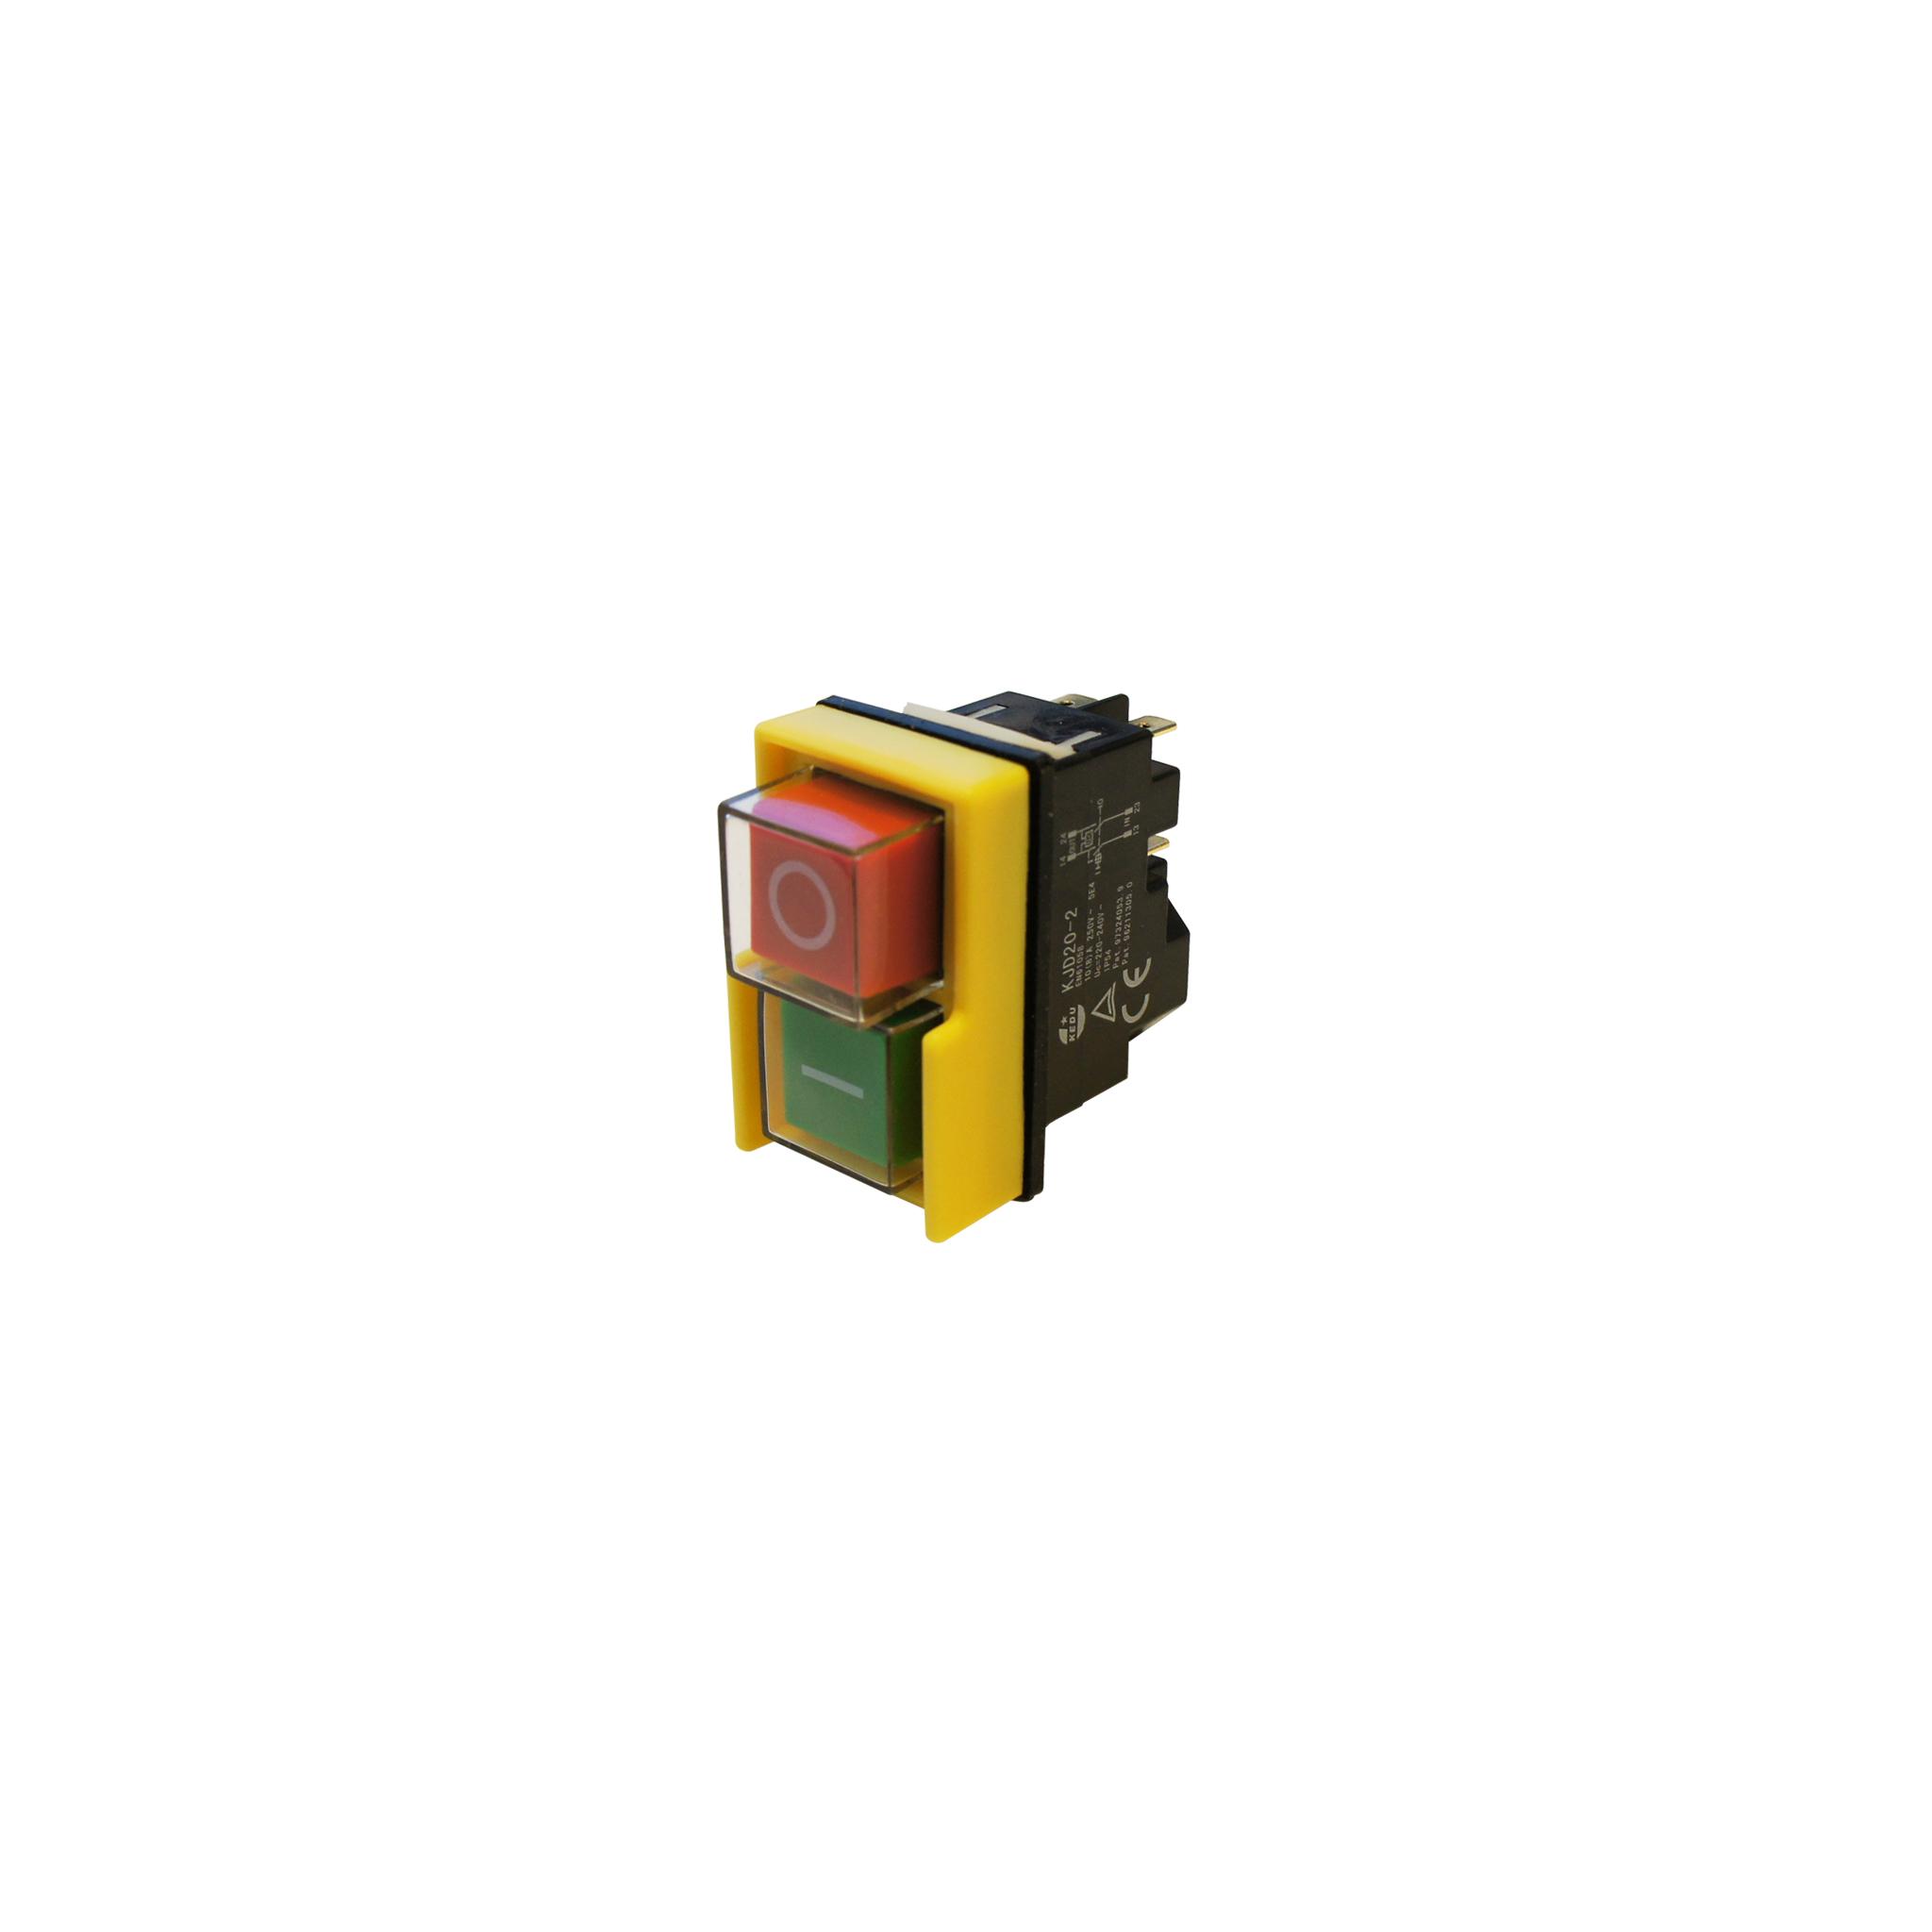 Power switch SB2 for Creusen